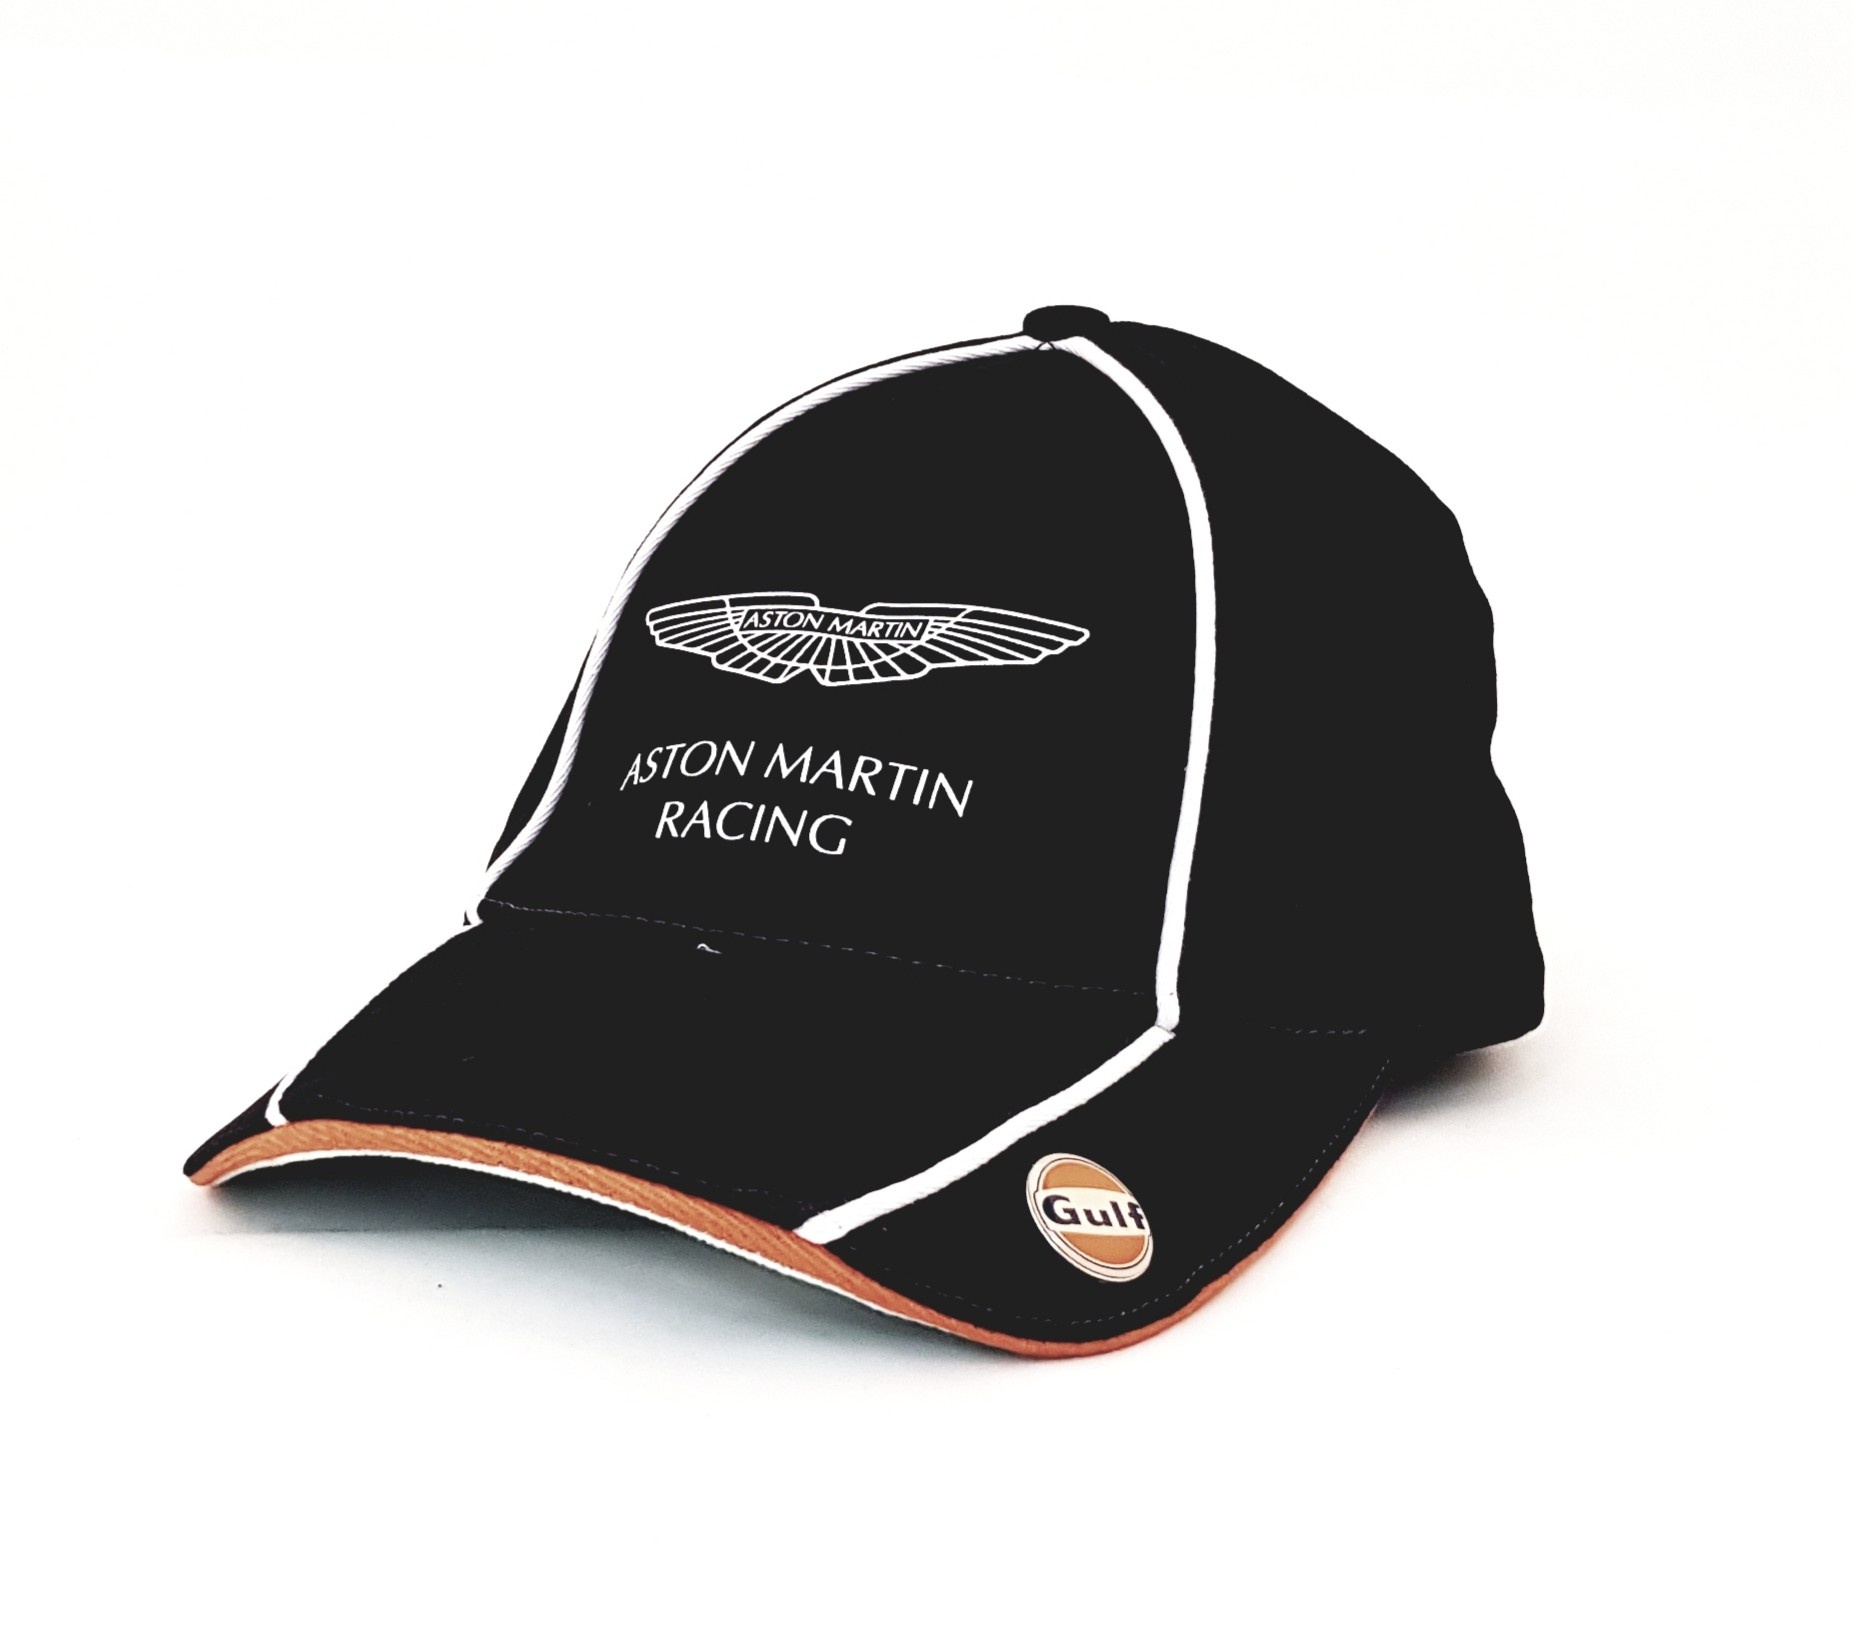 ASTON MARTIN Bērnu Vasaras Cepure